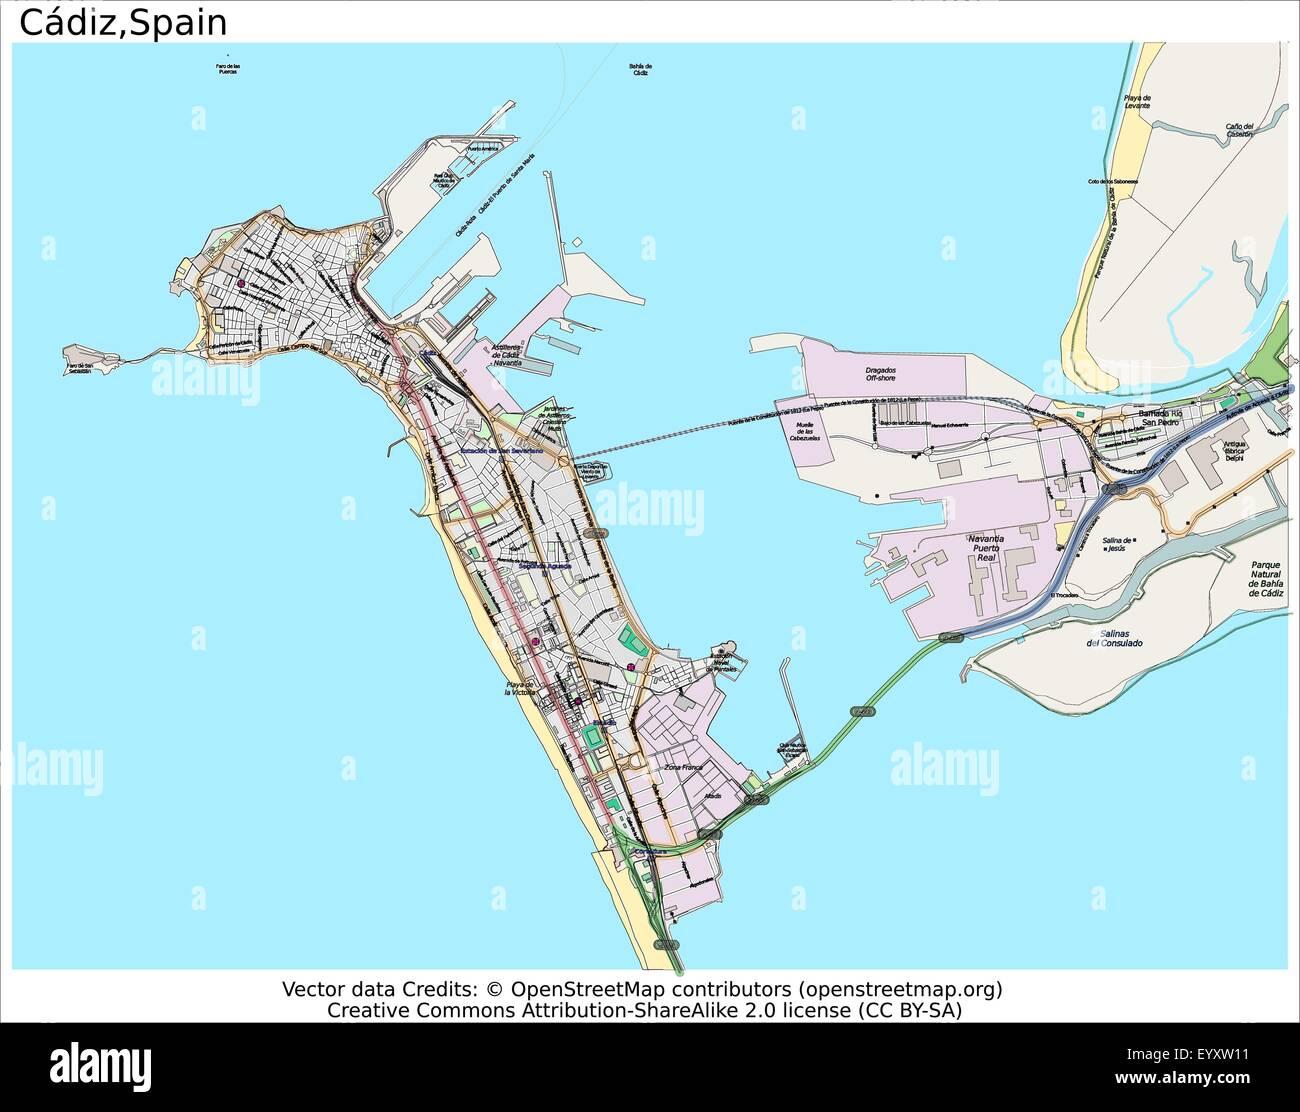 Cadiz Spain Country City Island State Location Map Stock Vector Art